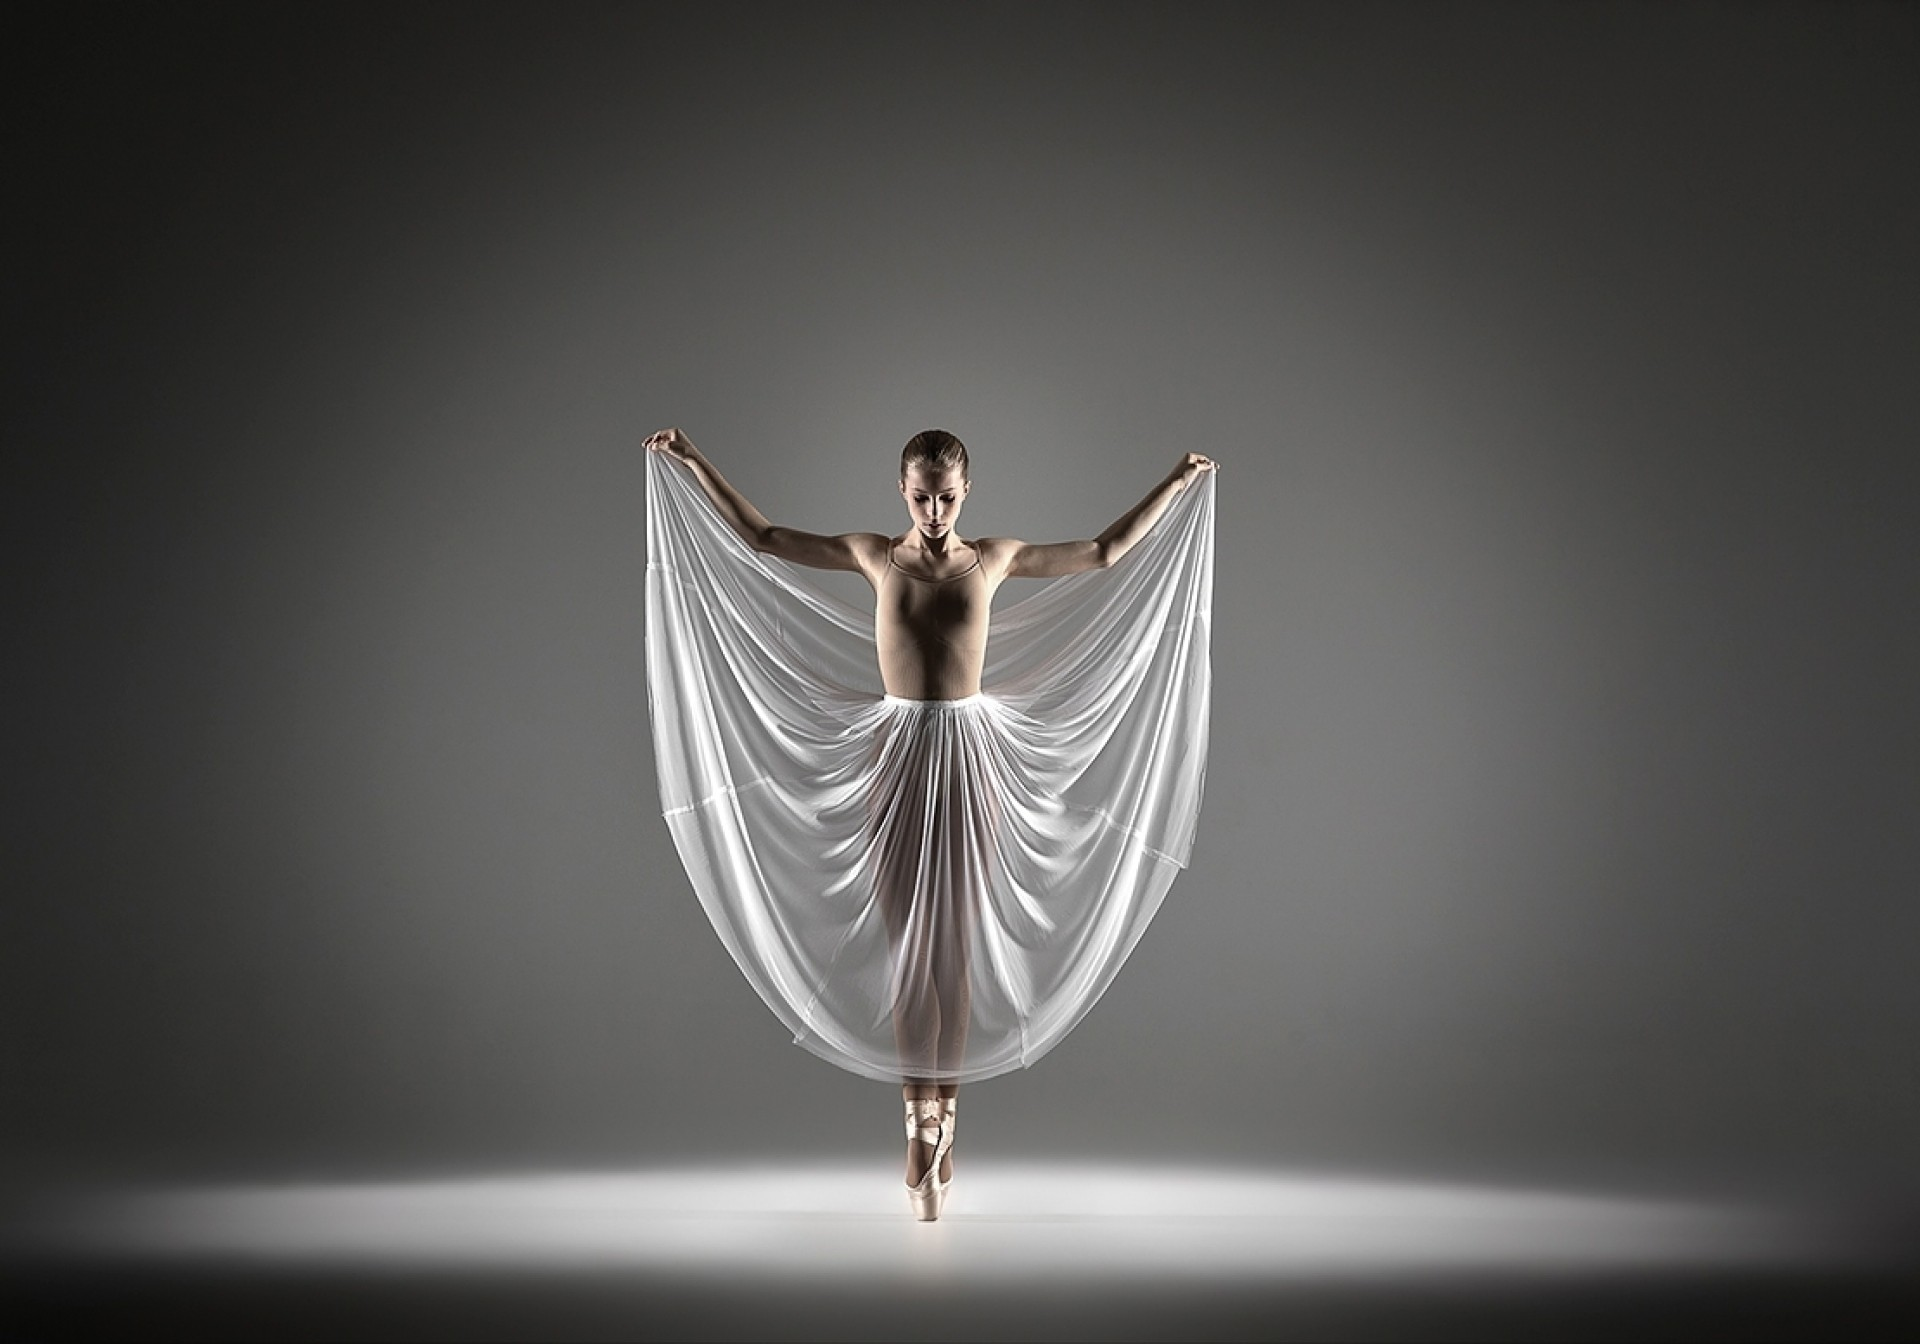 Ballett, Tänzerin, Eleganz, Ästhetik, Dance